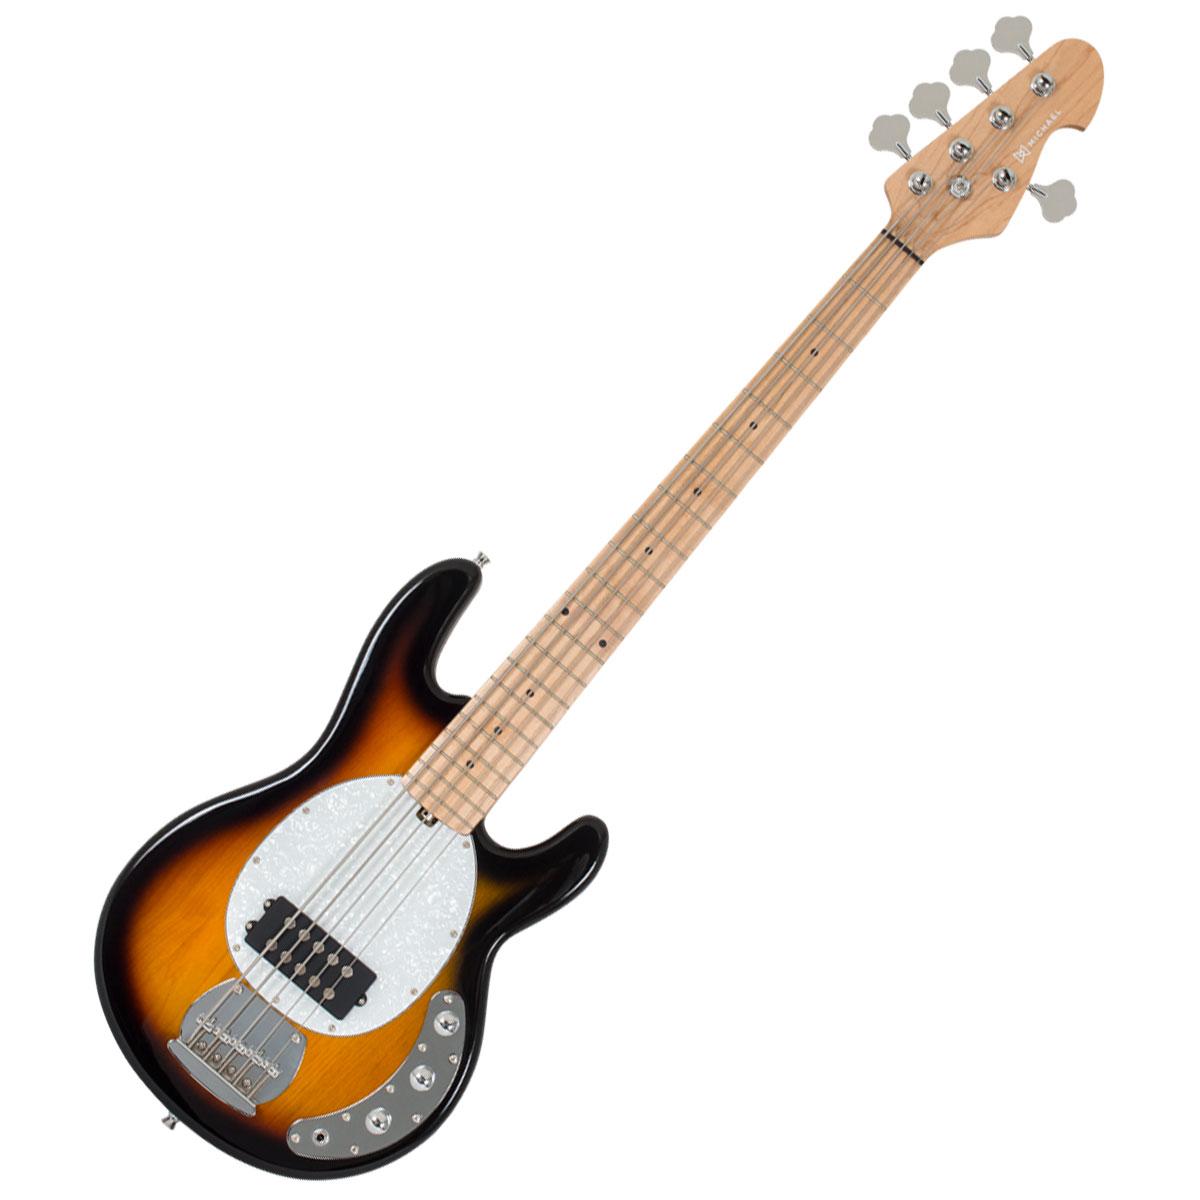 Contrabaixo 5 Cordas Passivo Modern Bass MM Style BM705 VS Vintage Sunburst - Michael